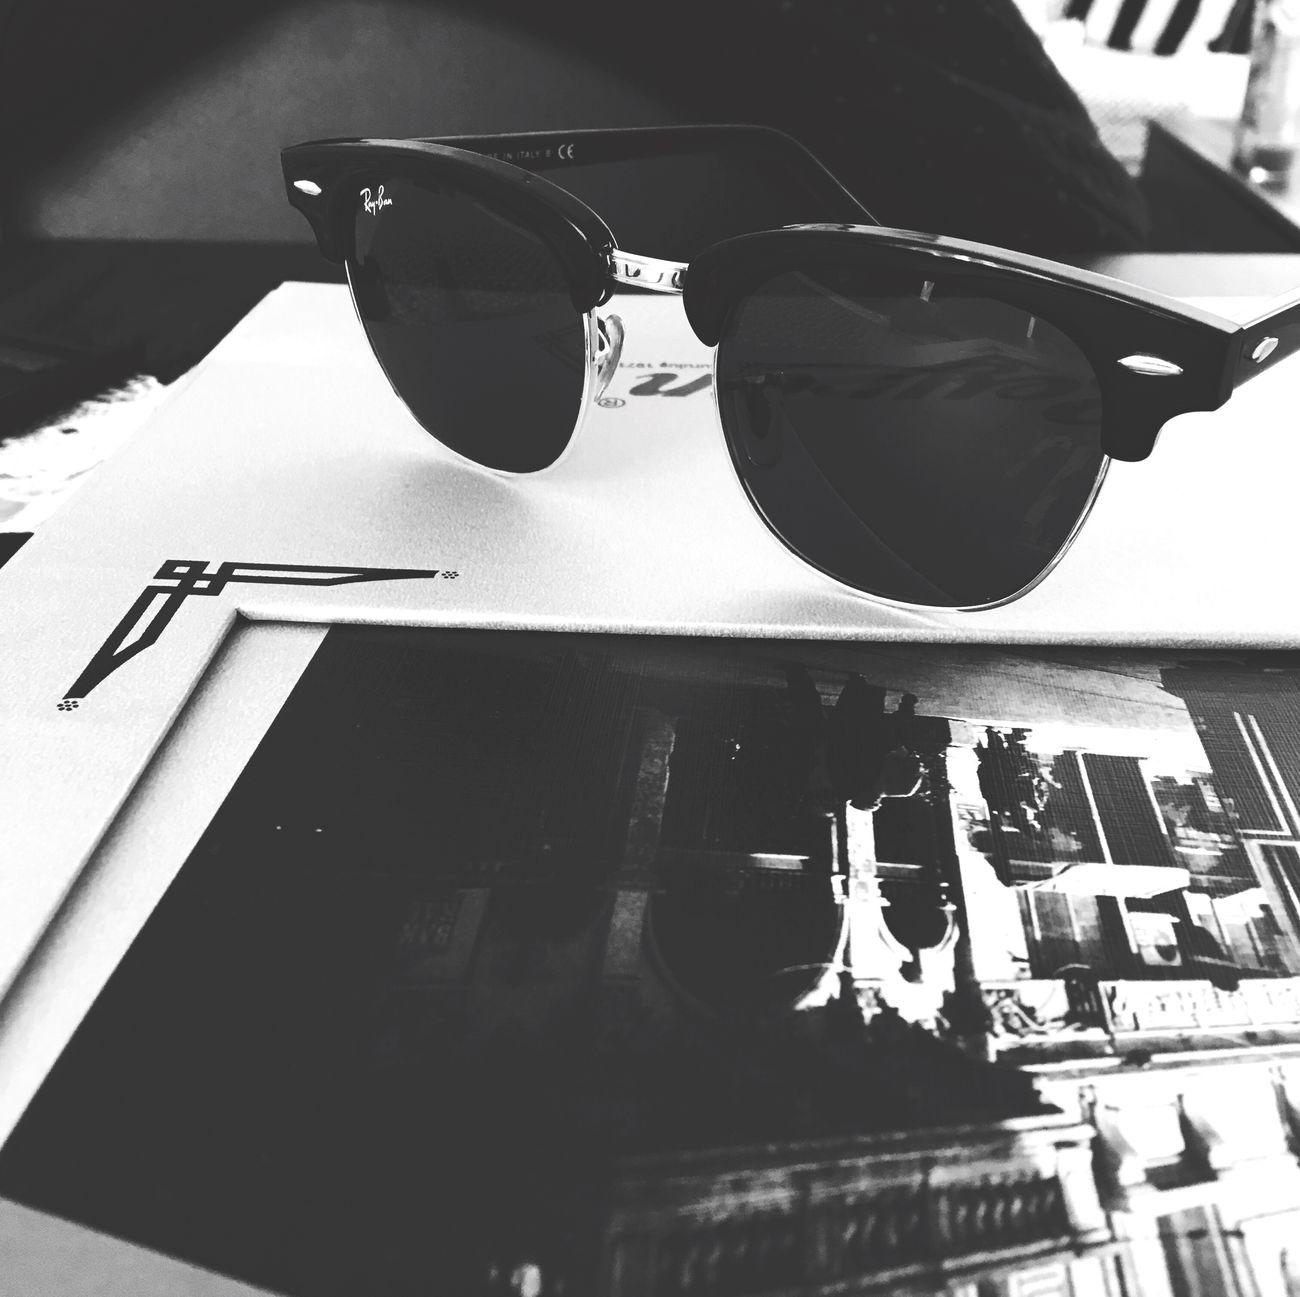 Glasses Rayban Good Blackandwhite Black And White Black & White Black White Black And White Photography Camera Snap Shot Shoot Nofilter Look Insta Like Likeforme Follow Followme Post Entry Turkish Takip Follower